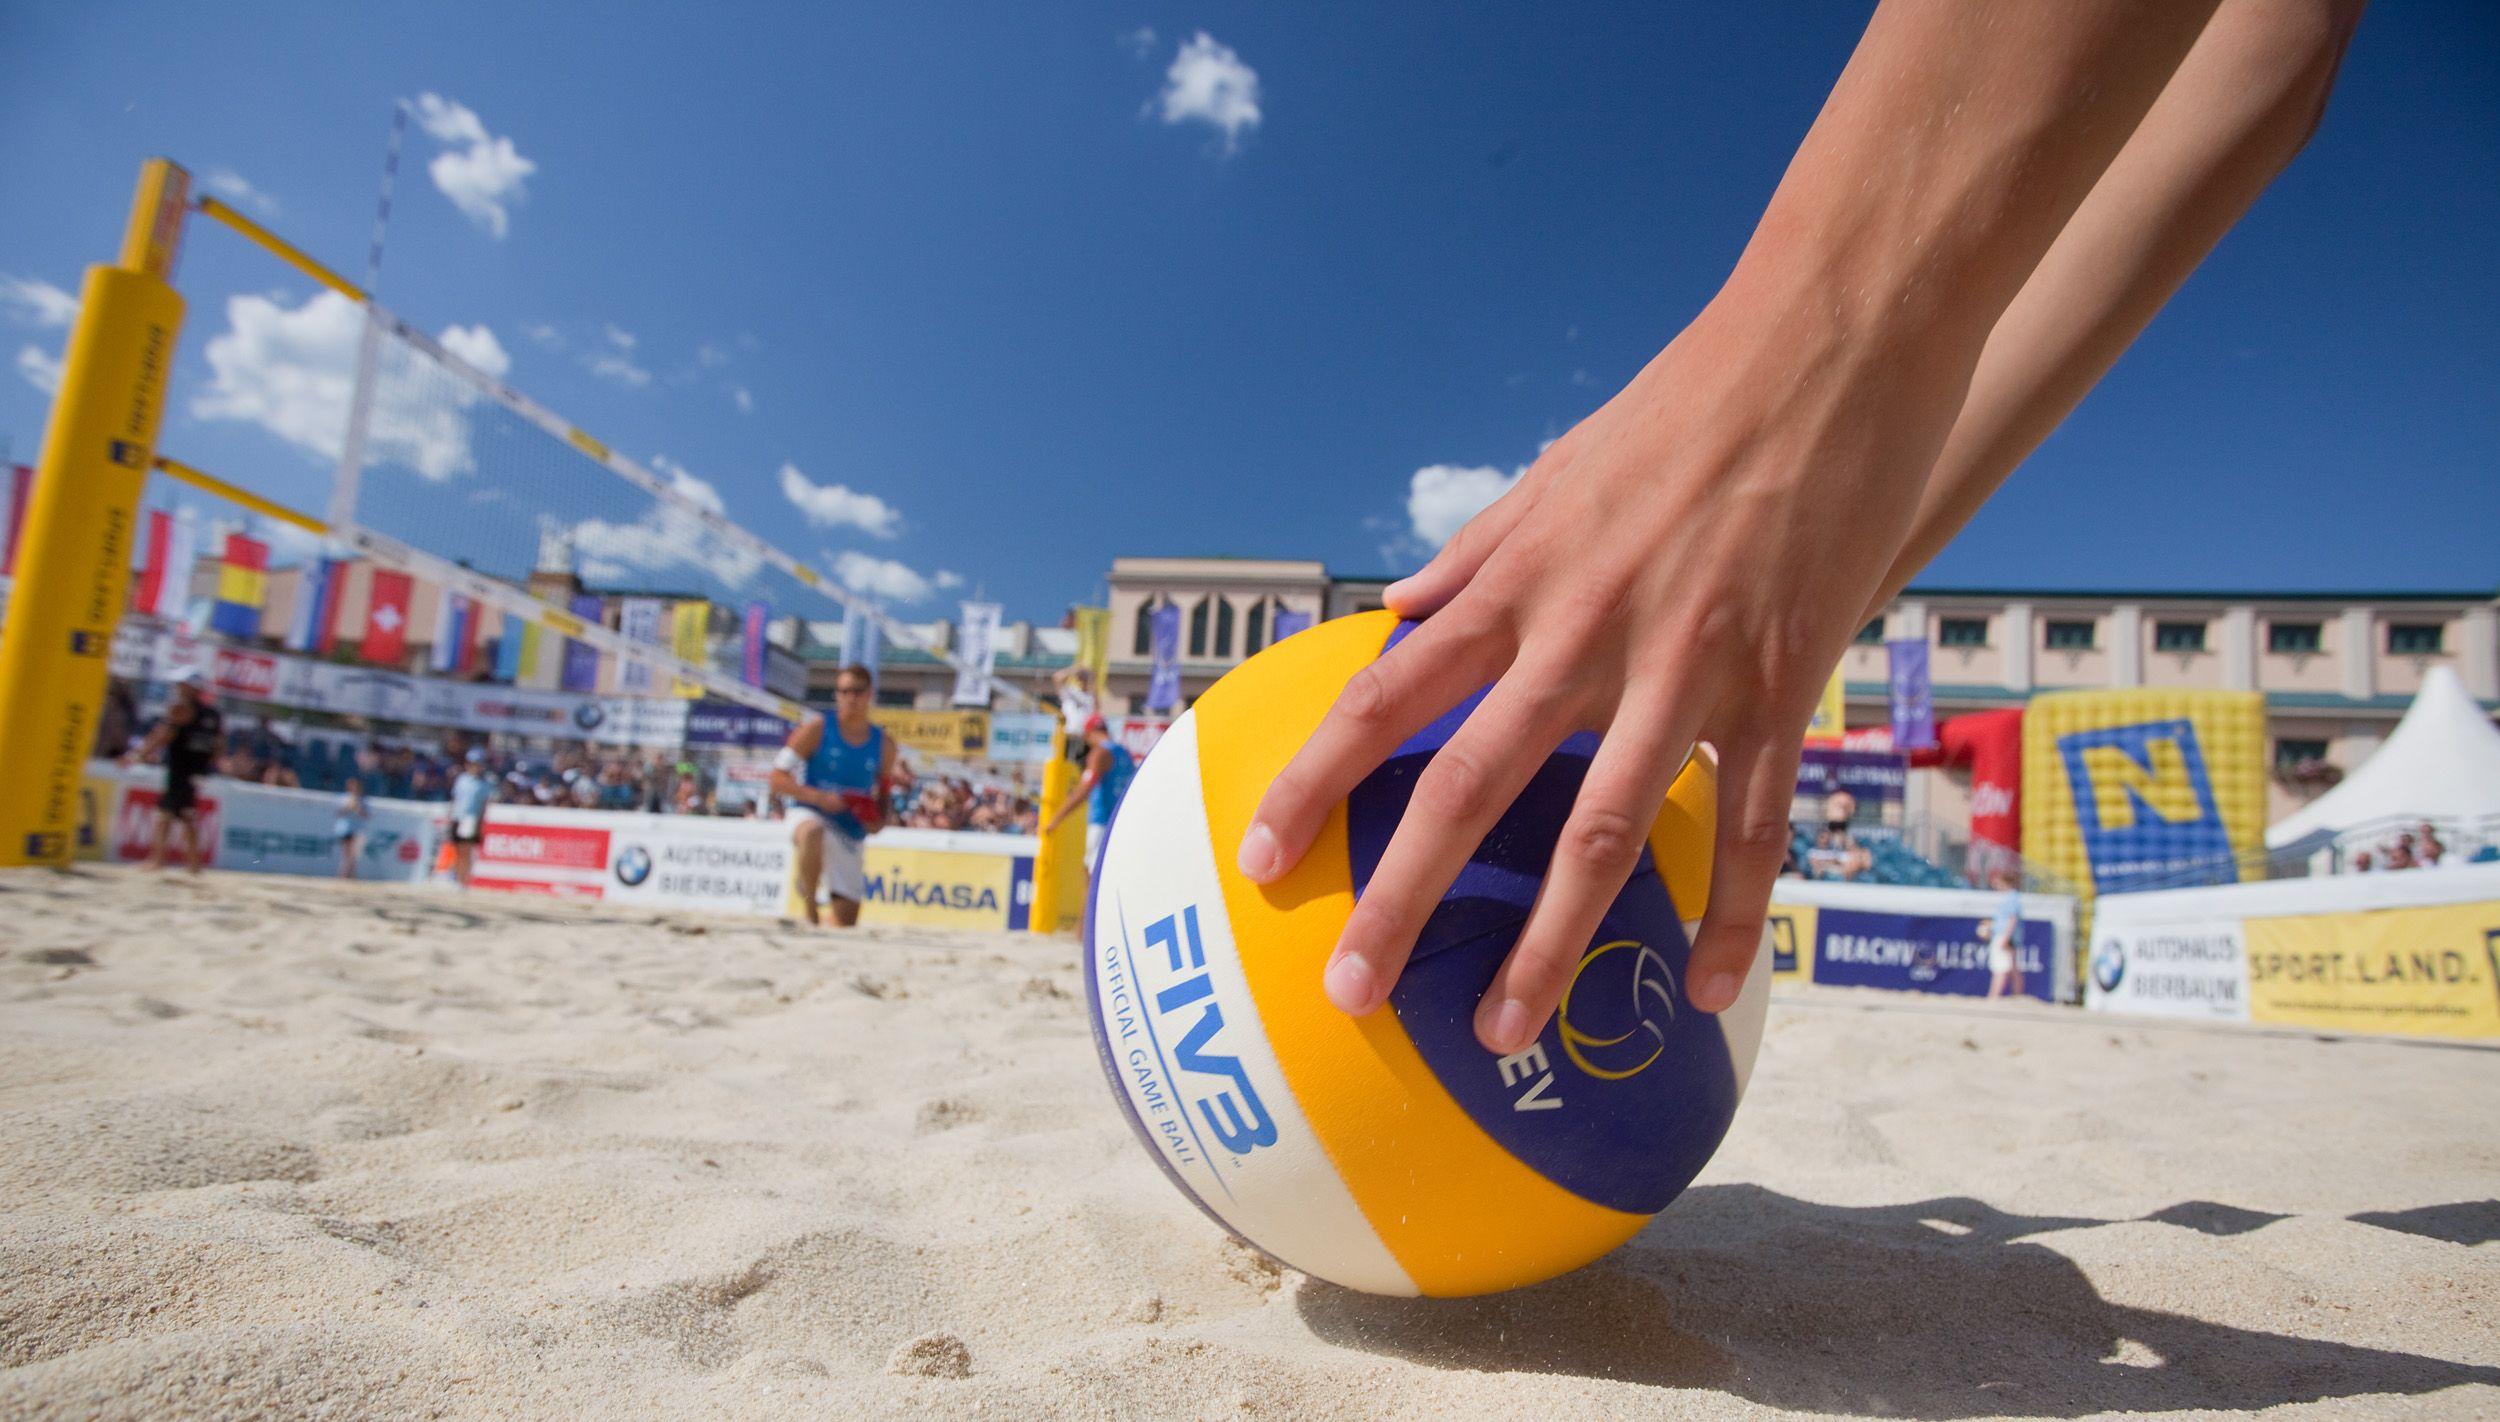 Women's World Cup Alternates Volleyball